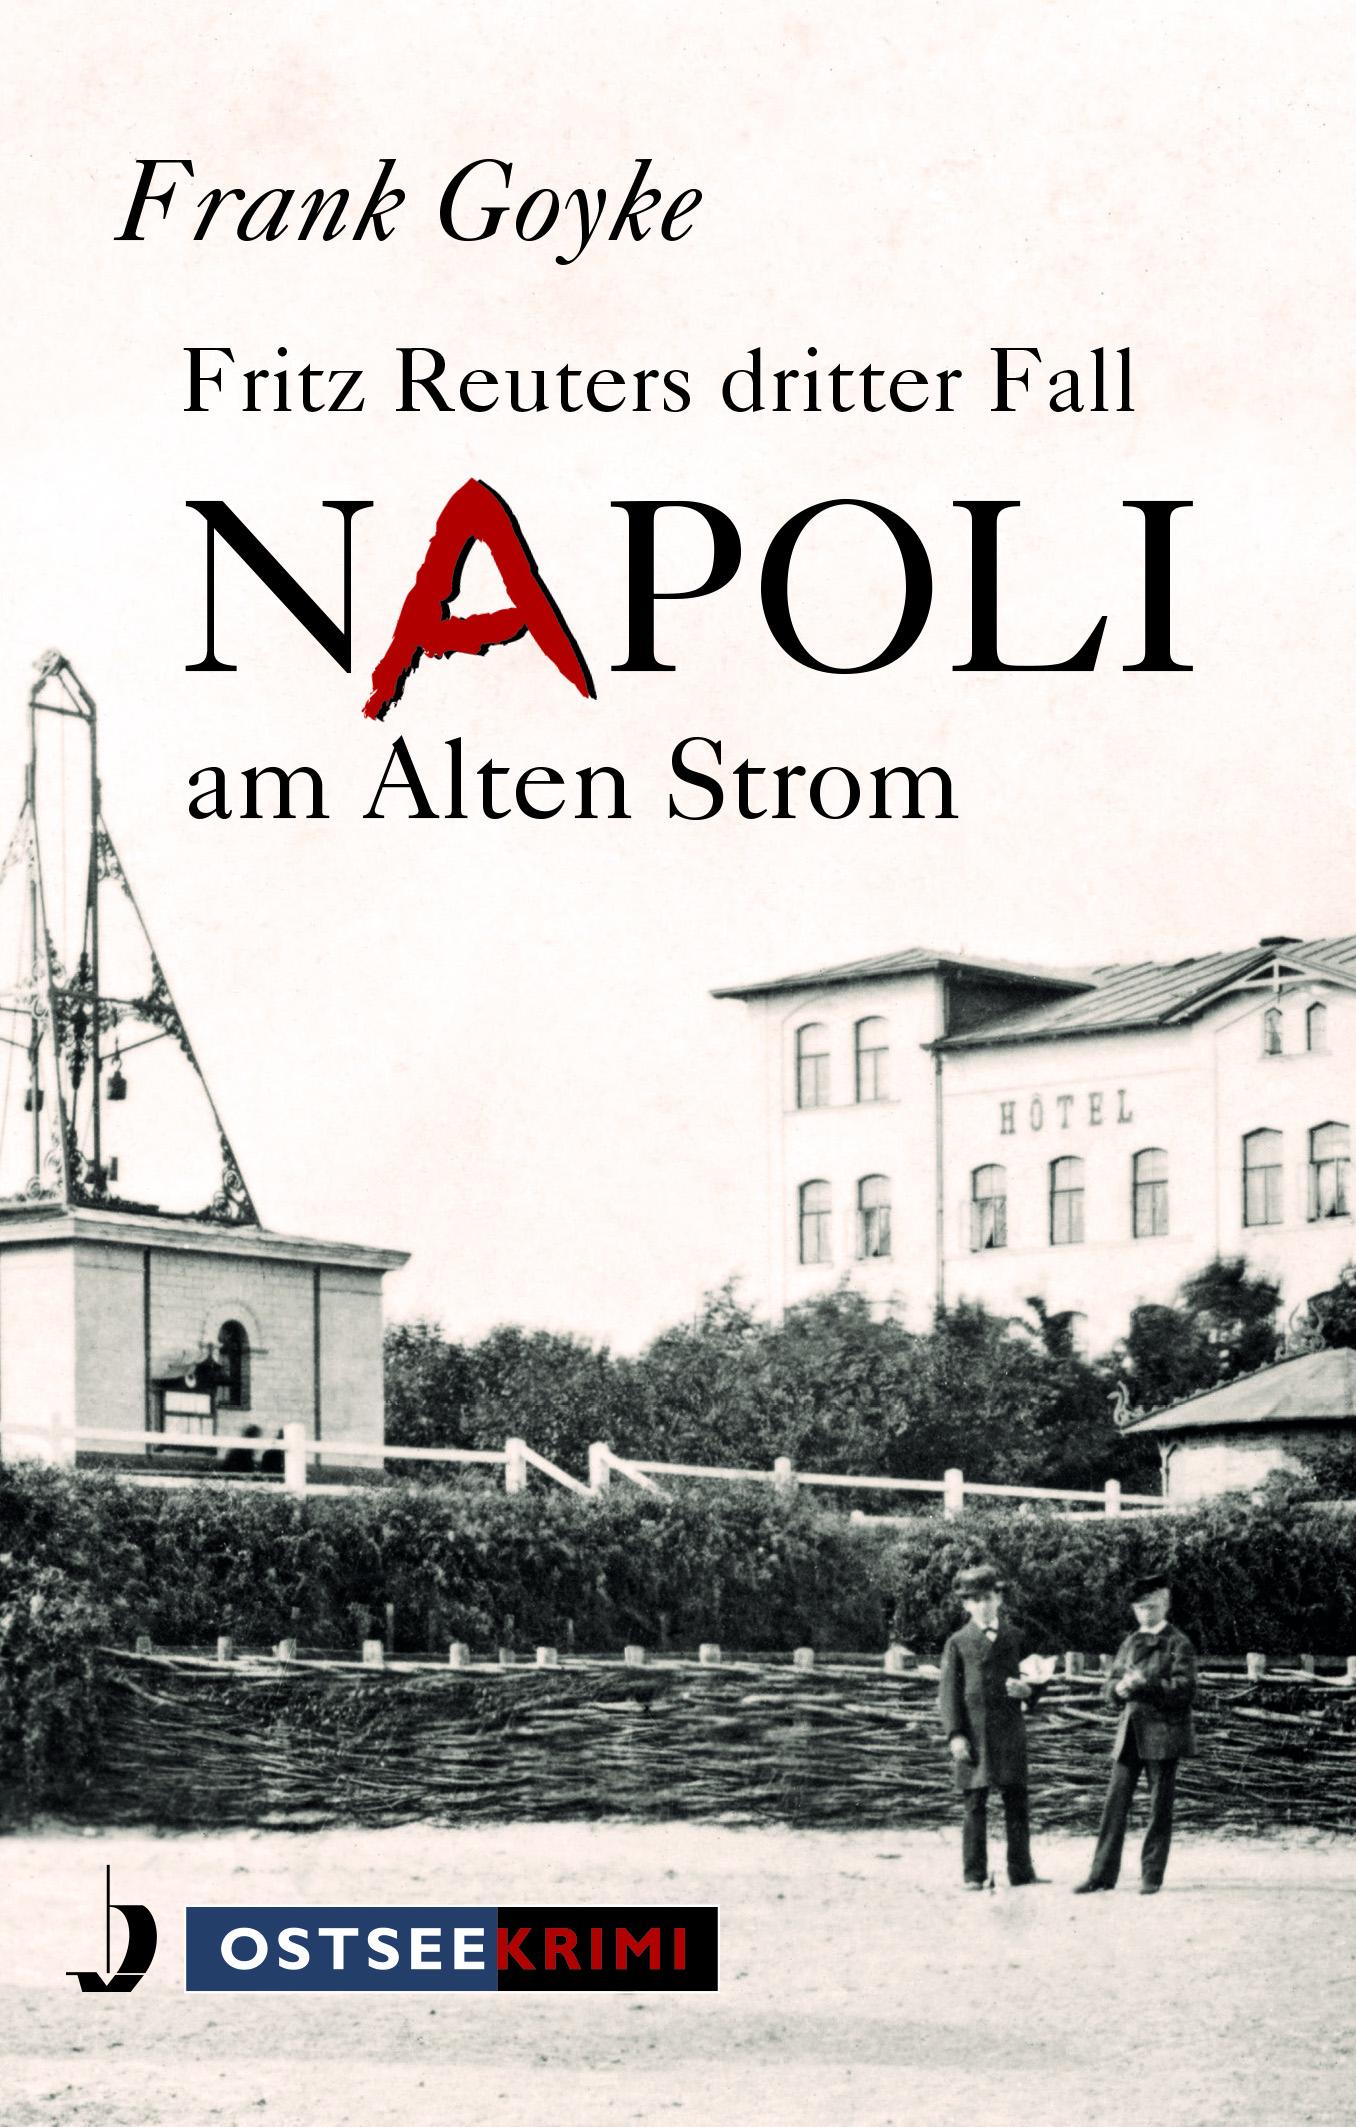 Napoli am Alten Strom. Fritz Reuters dritter Fall